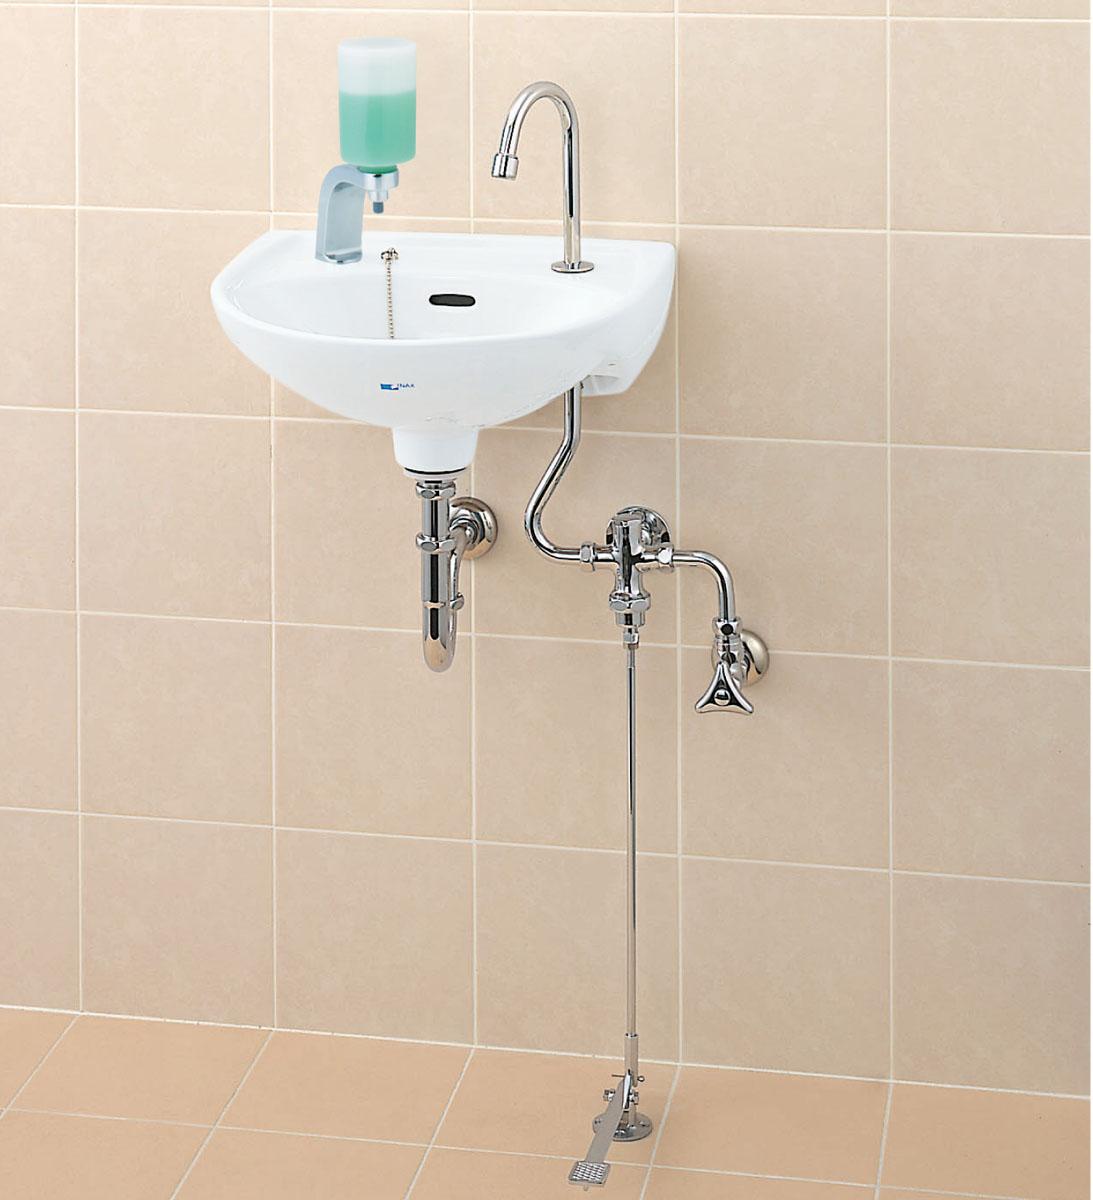 ◇LIXIL INAX 医療施設用流し足踏式手洗水栓セットSトラップ【品番L-15G】【MSIウェブショップ】